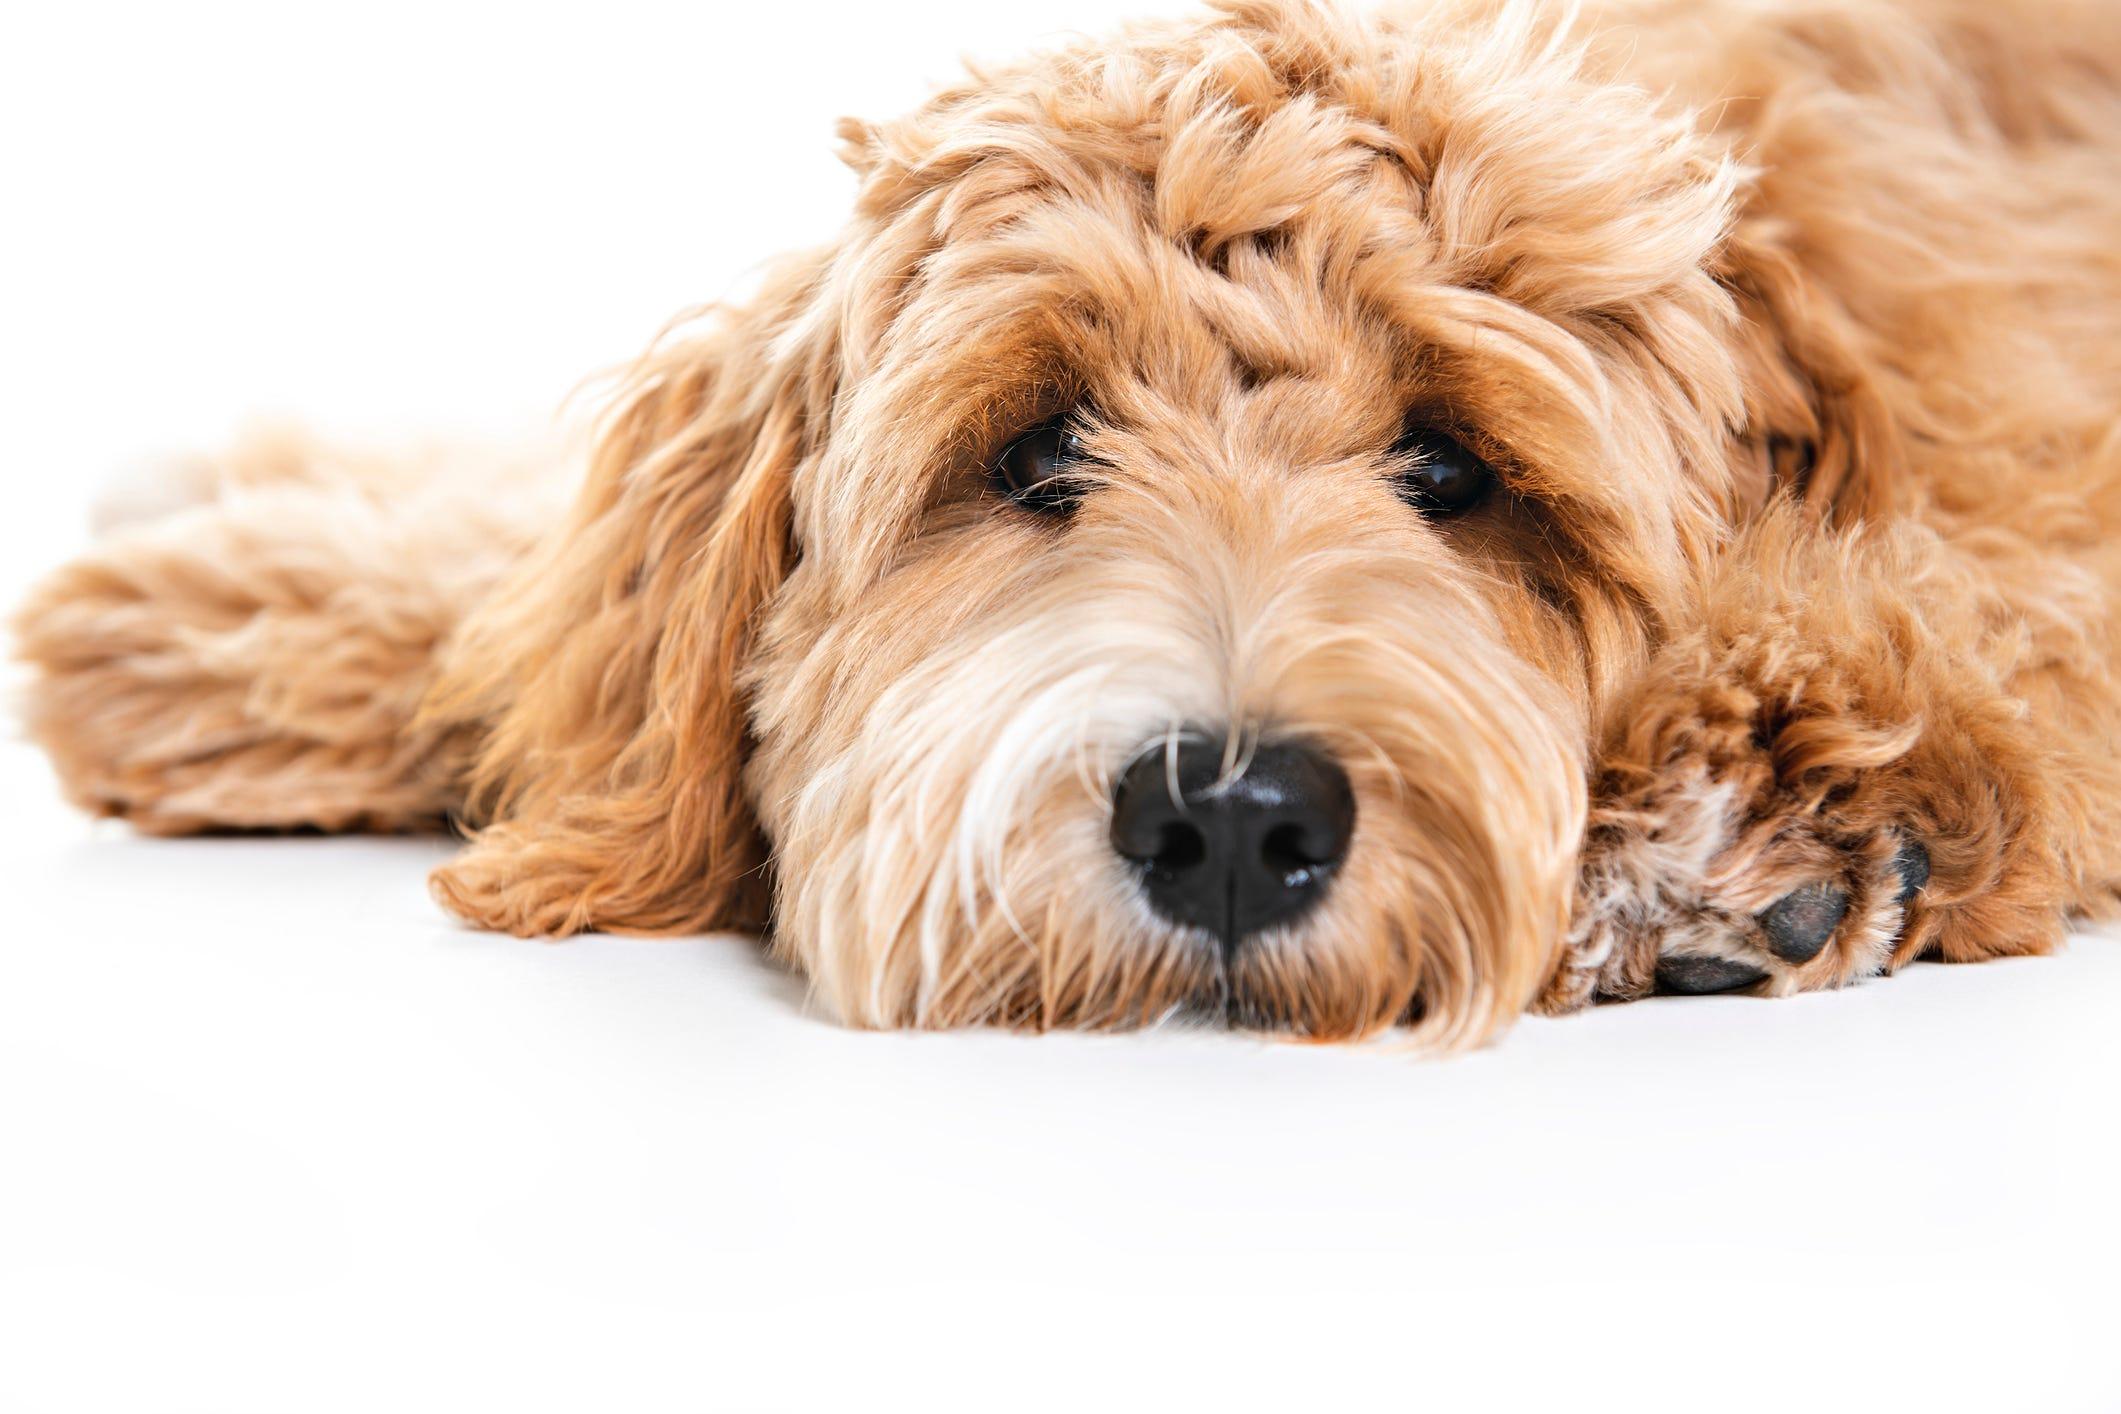 5 most popular dog breeds in Detroit: Labradoodle tops list